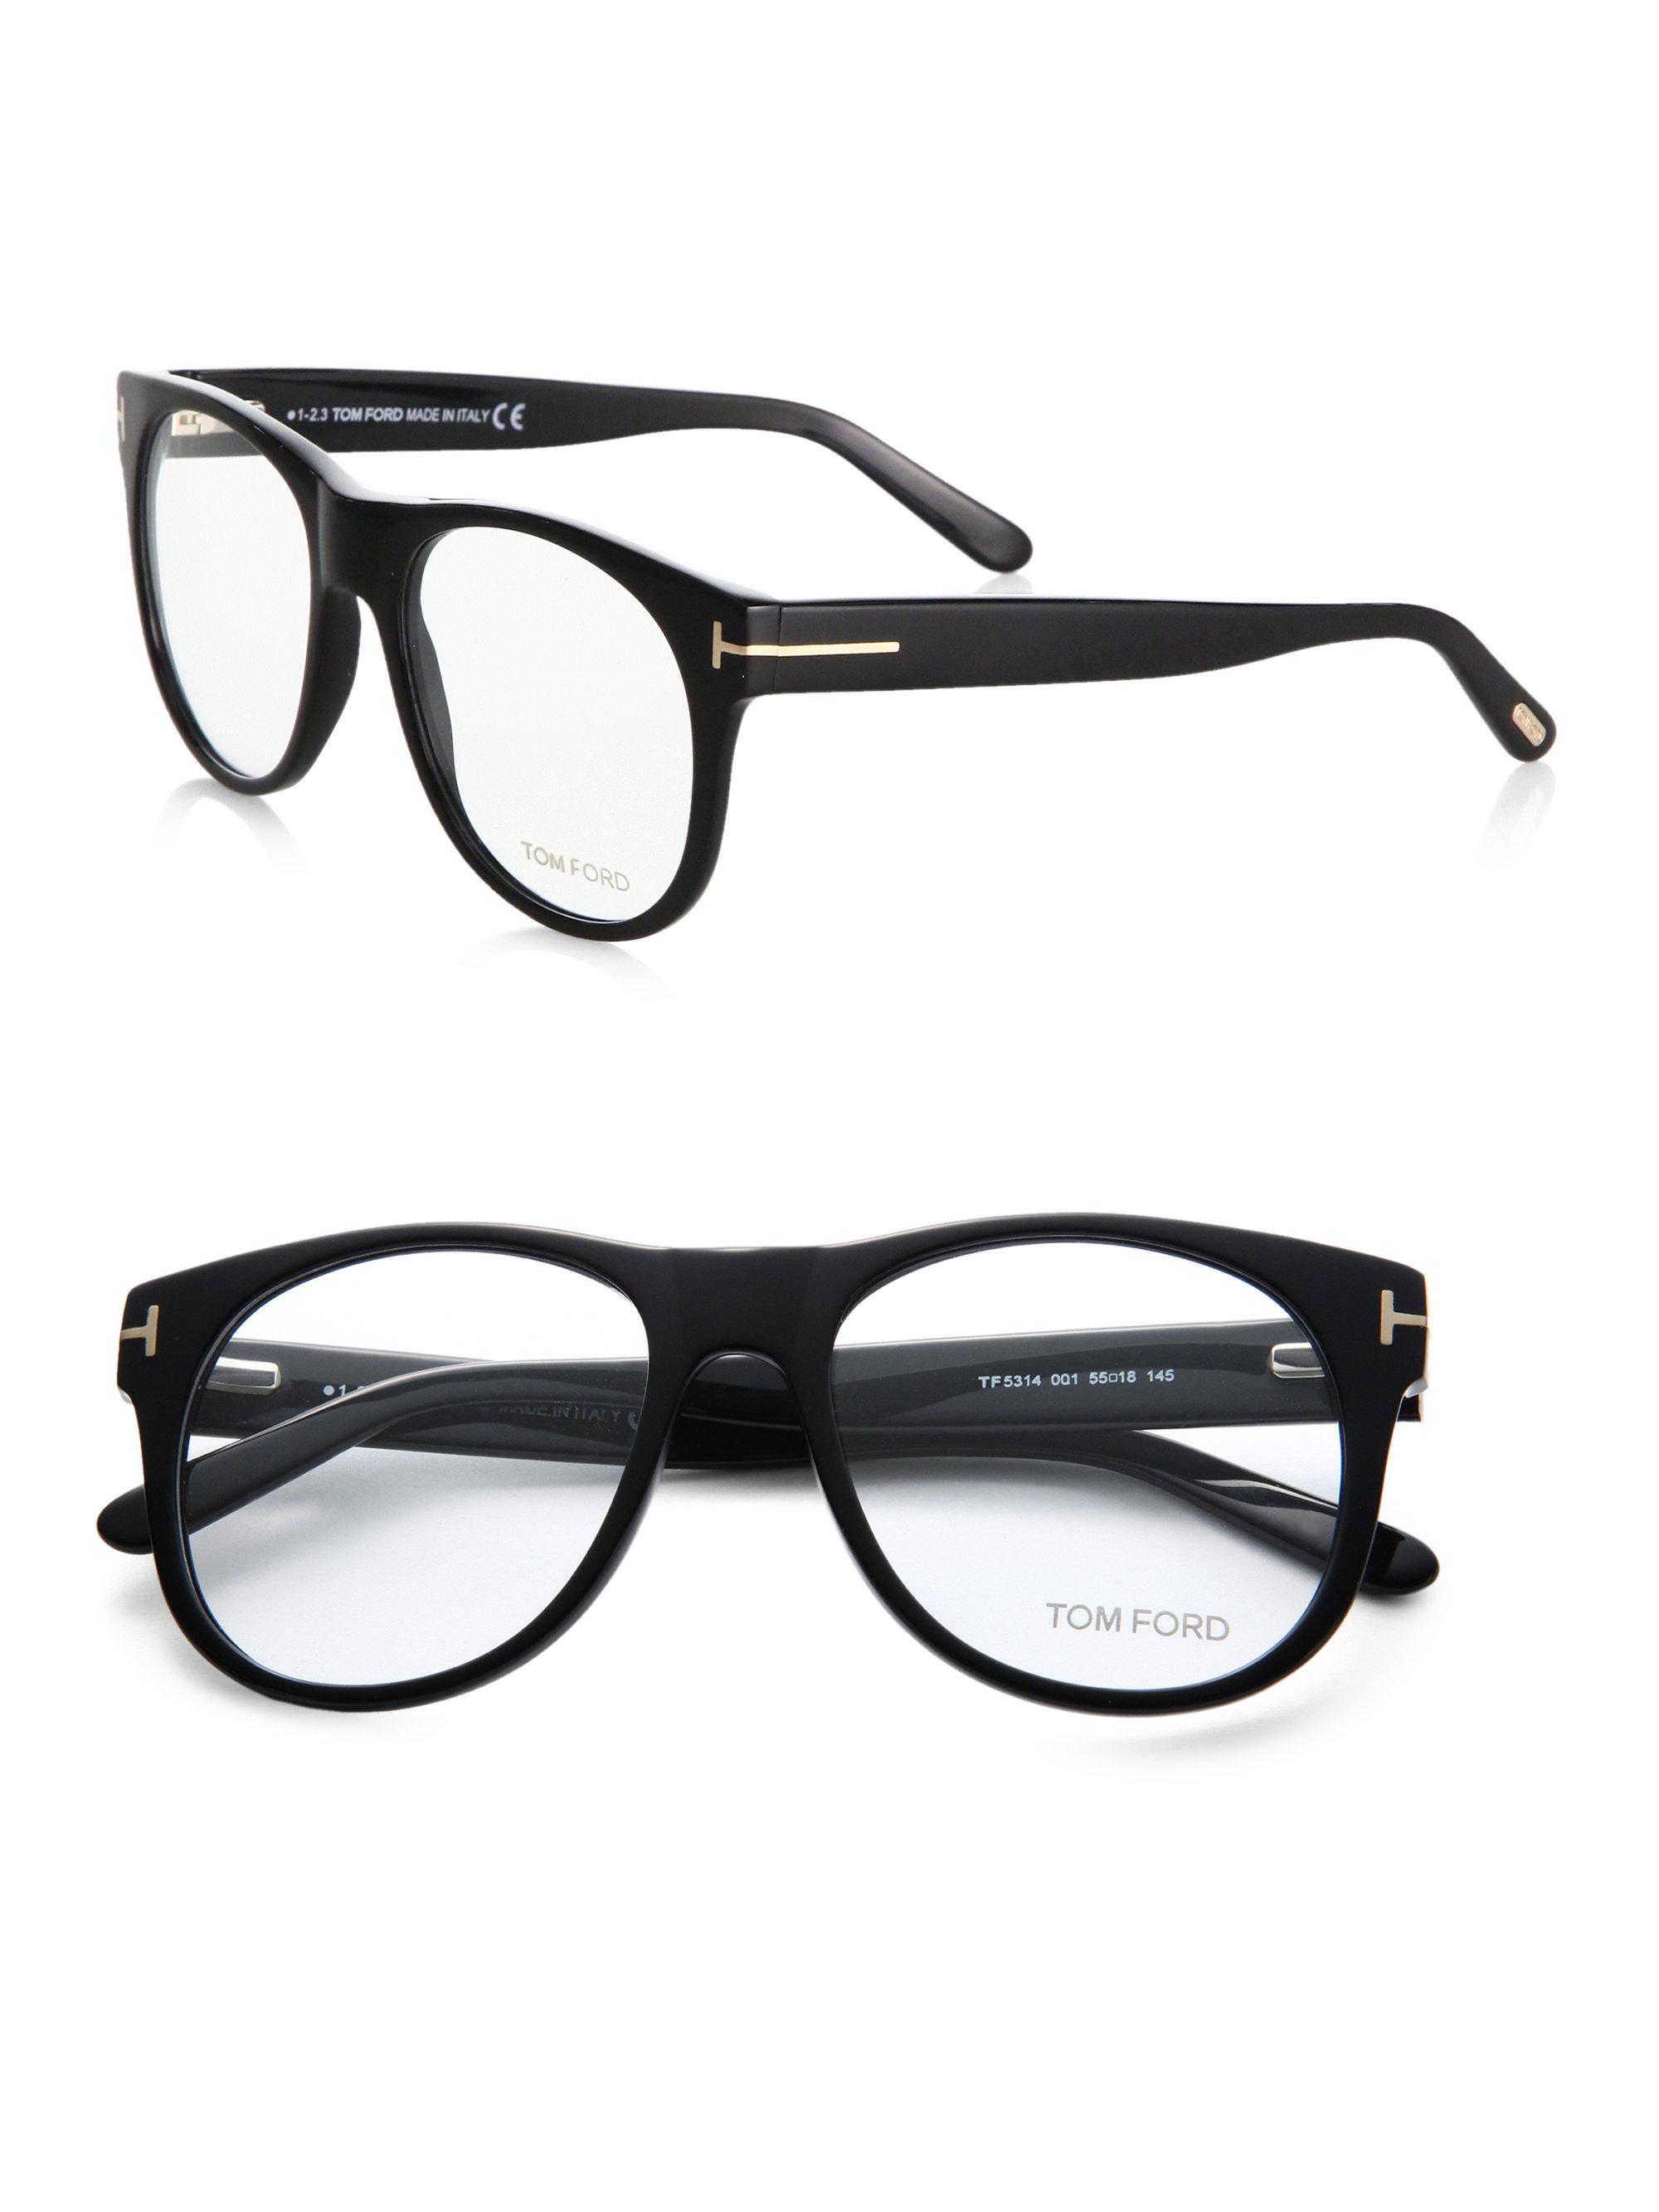 498228eff81 Lyst - Tom Ford Oversized Optical Glasses in Black